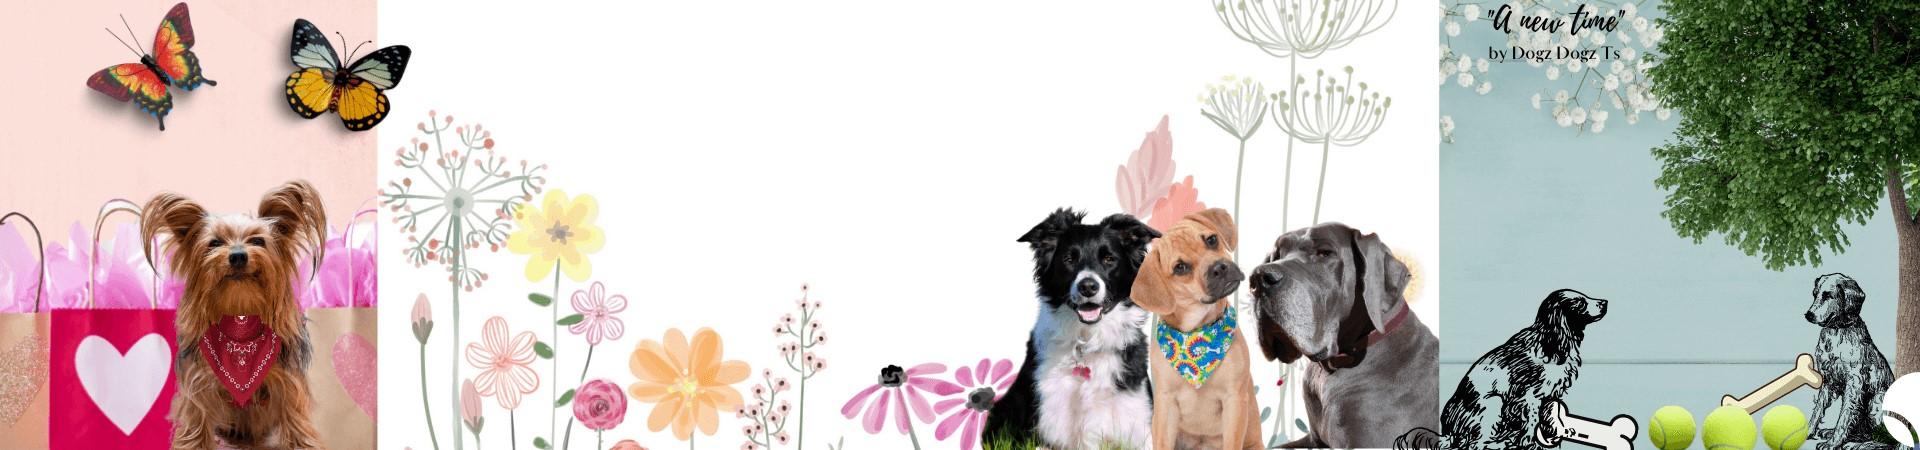 It's A New Time (Springtime) on BarkYours.com